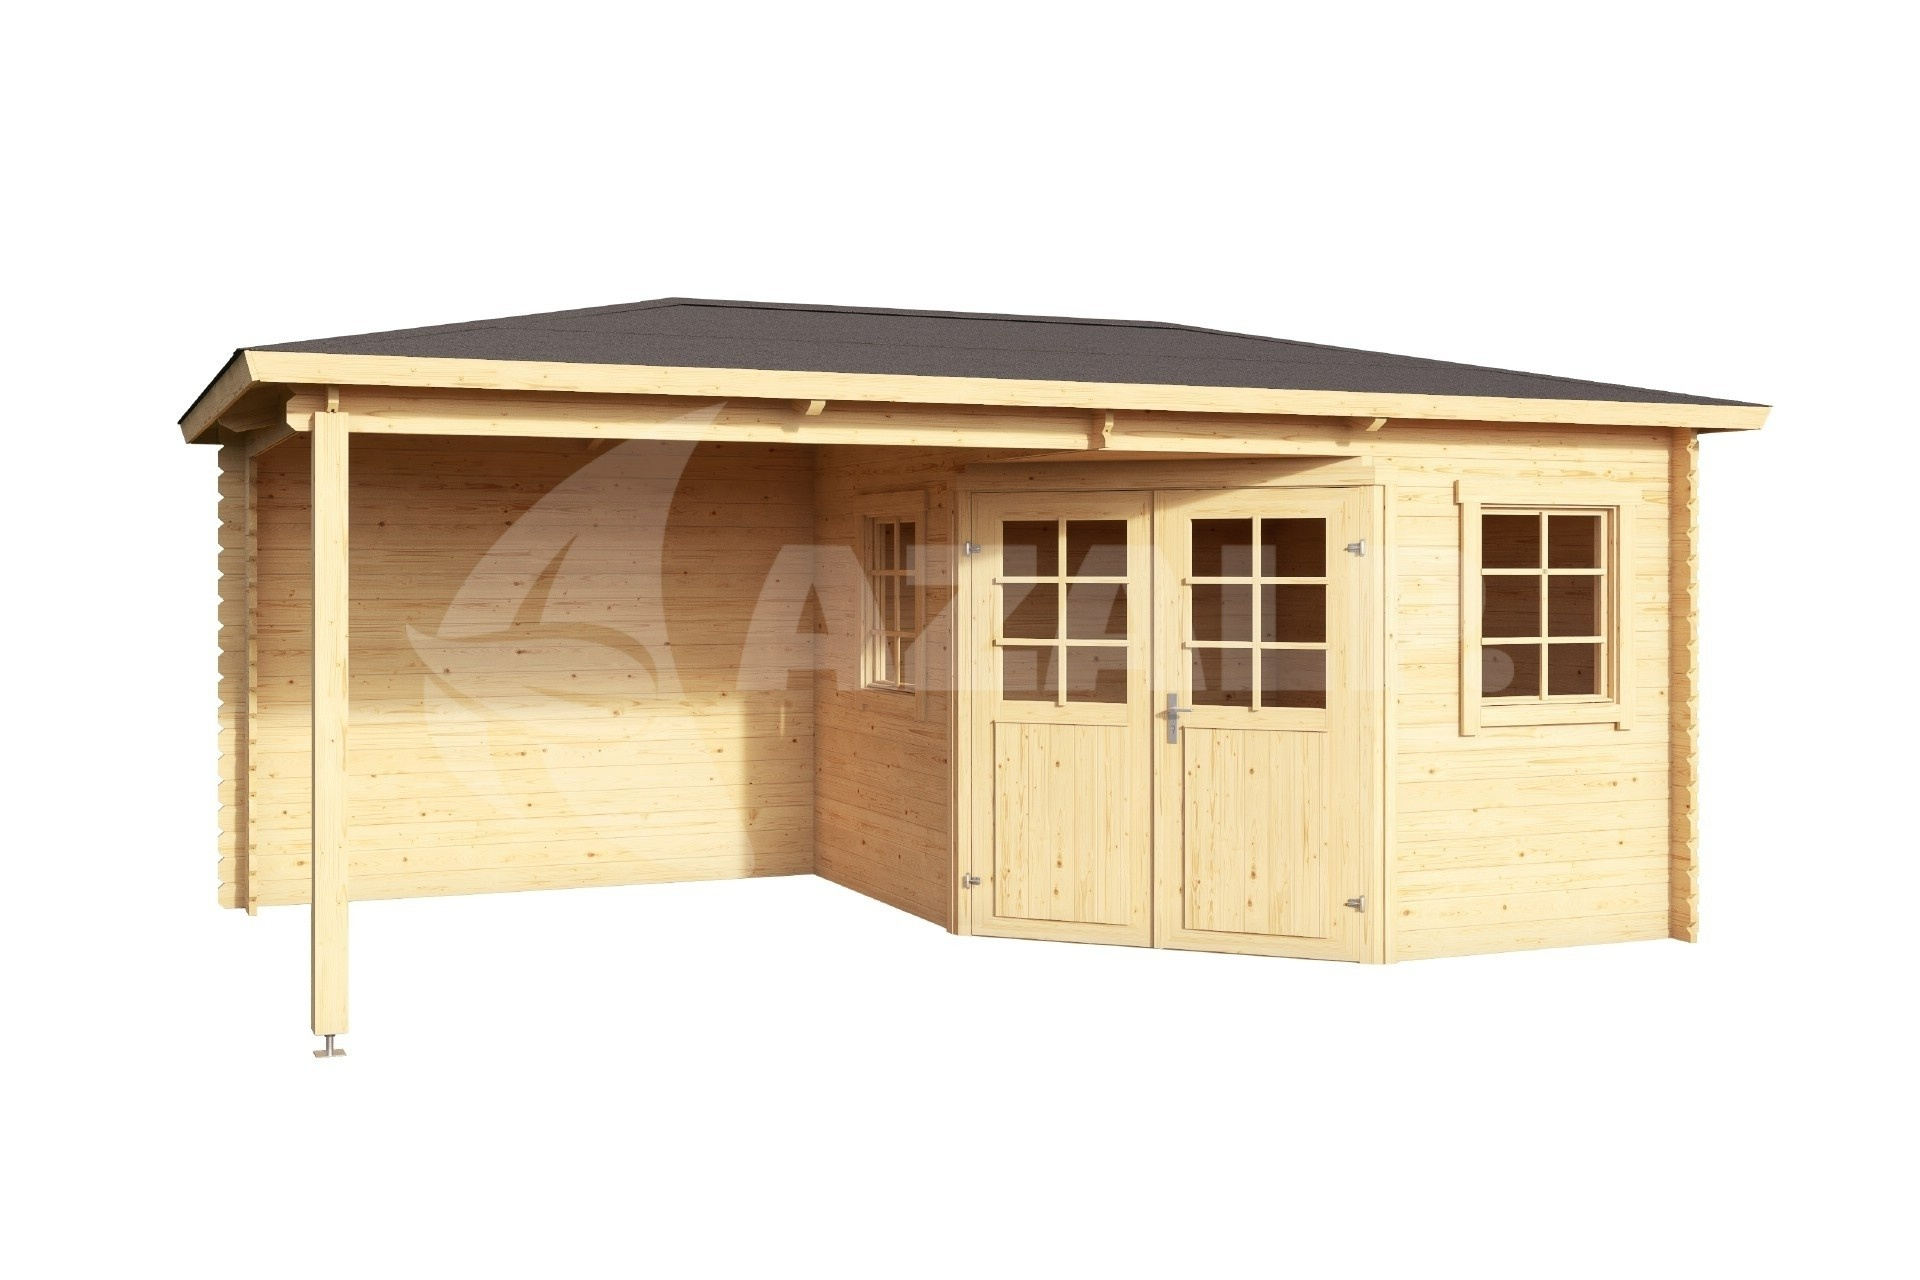 grunland kendra 2839596 aktion kaufen bei. Black Bedroom Furniture Sets. Home Design Ideas